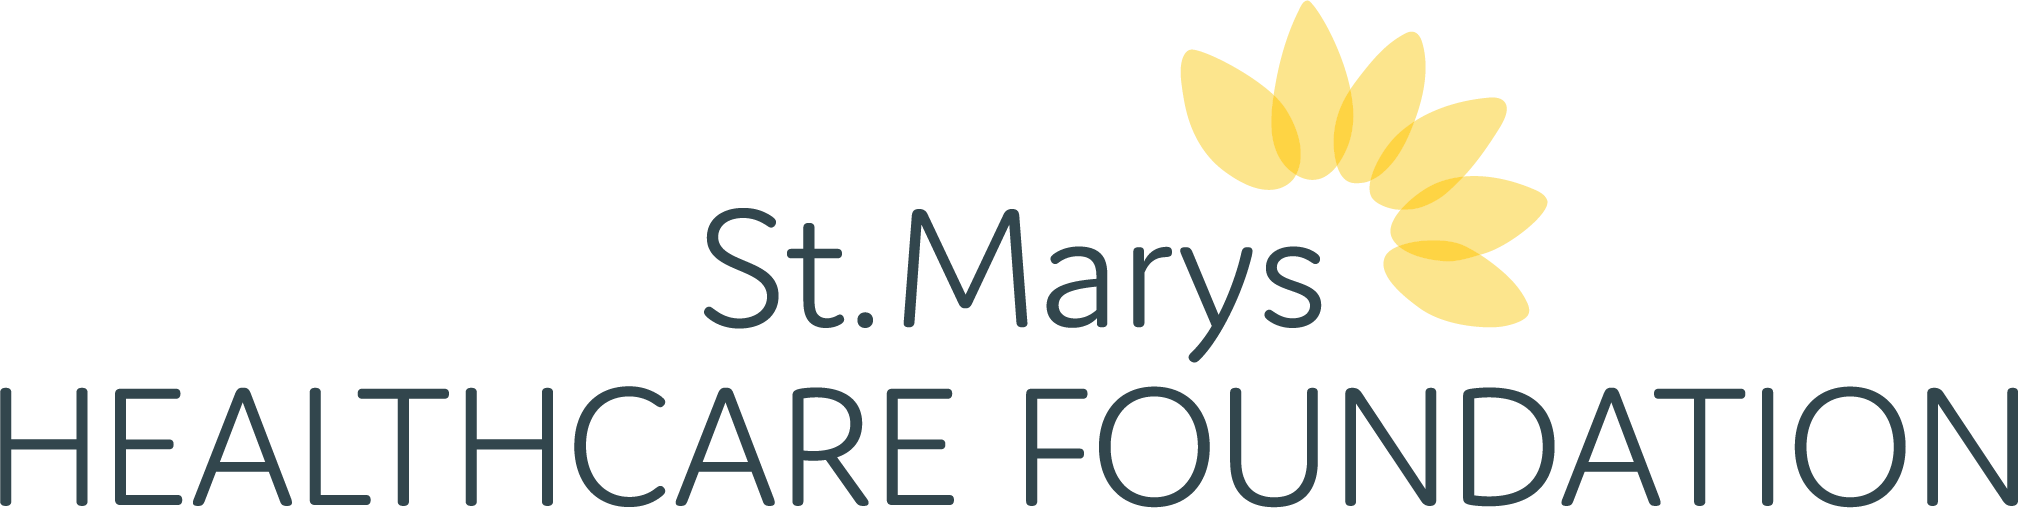 St. Marys Healthcare Foundation